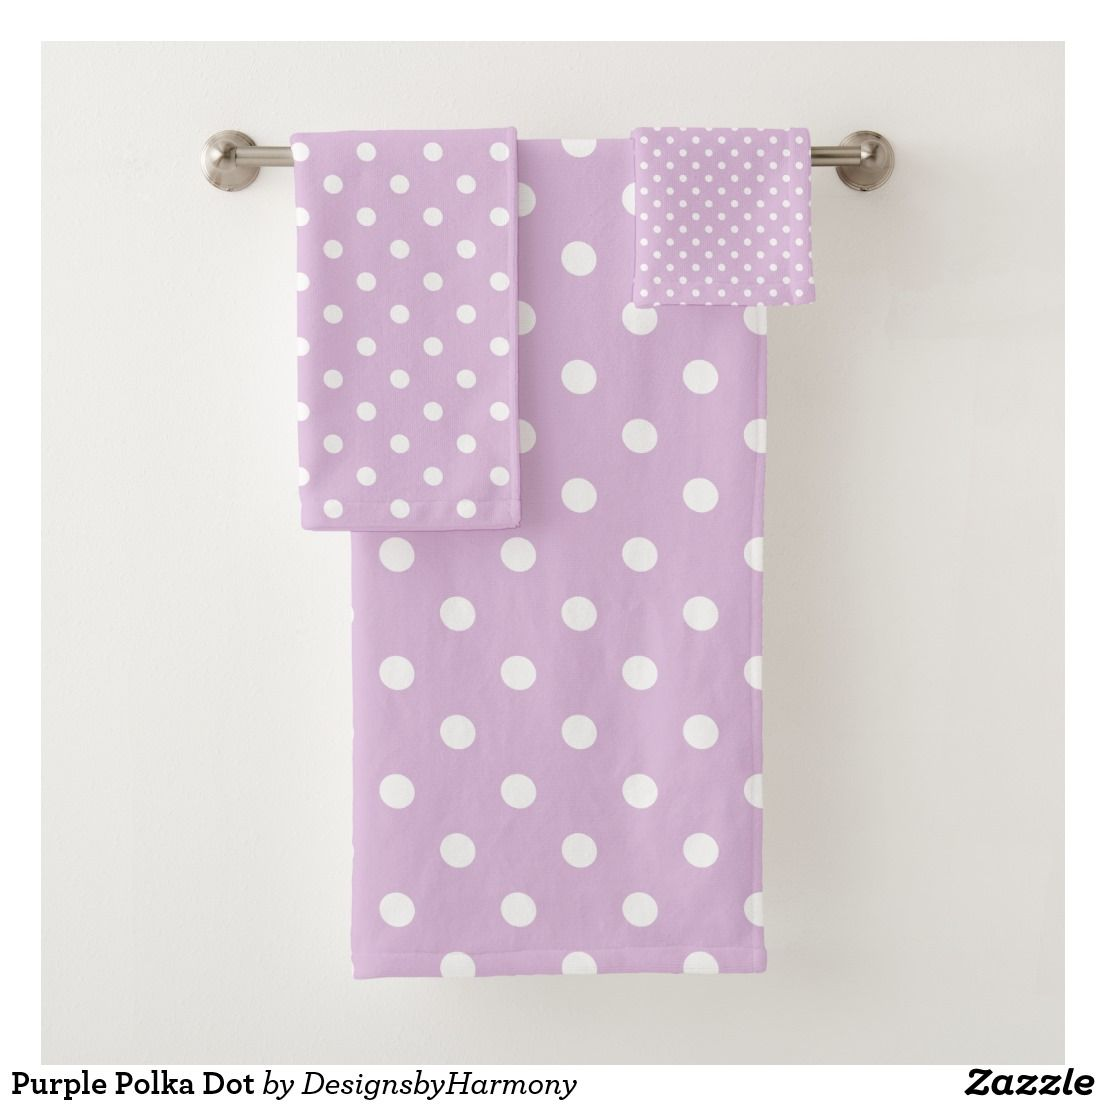 Purple Polka Dot Bath Towel Set Zazzle Com With Images Bath